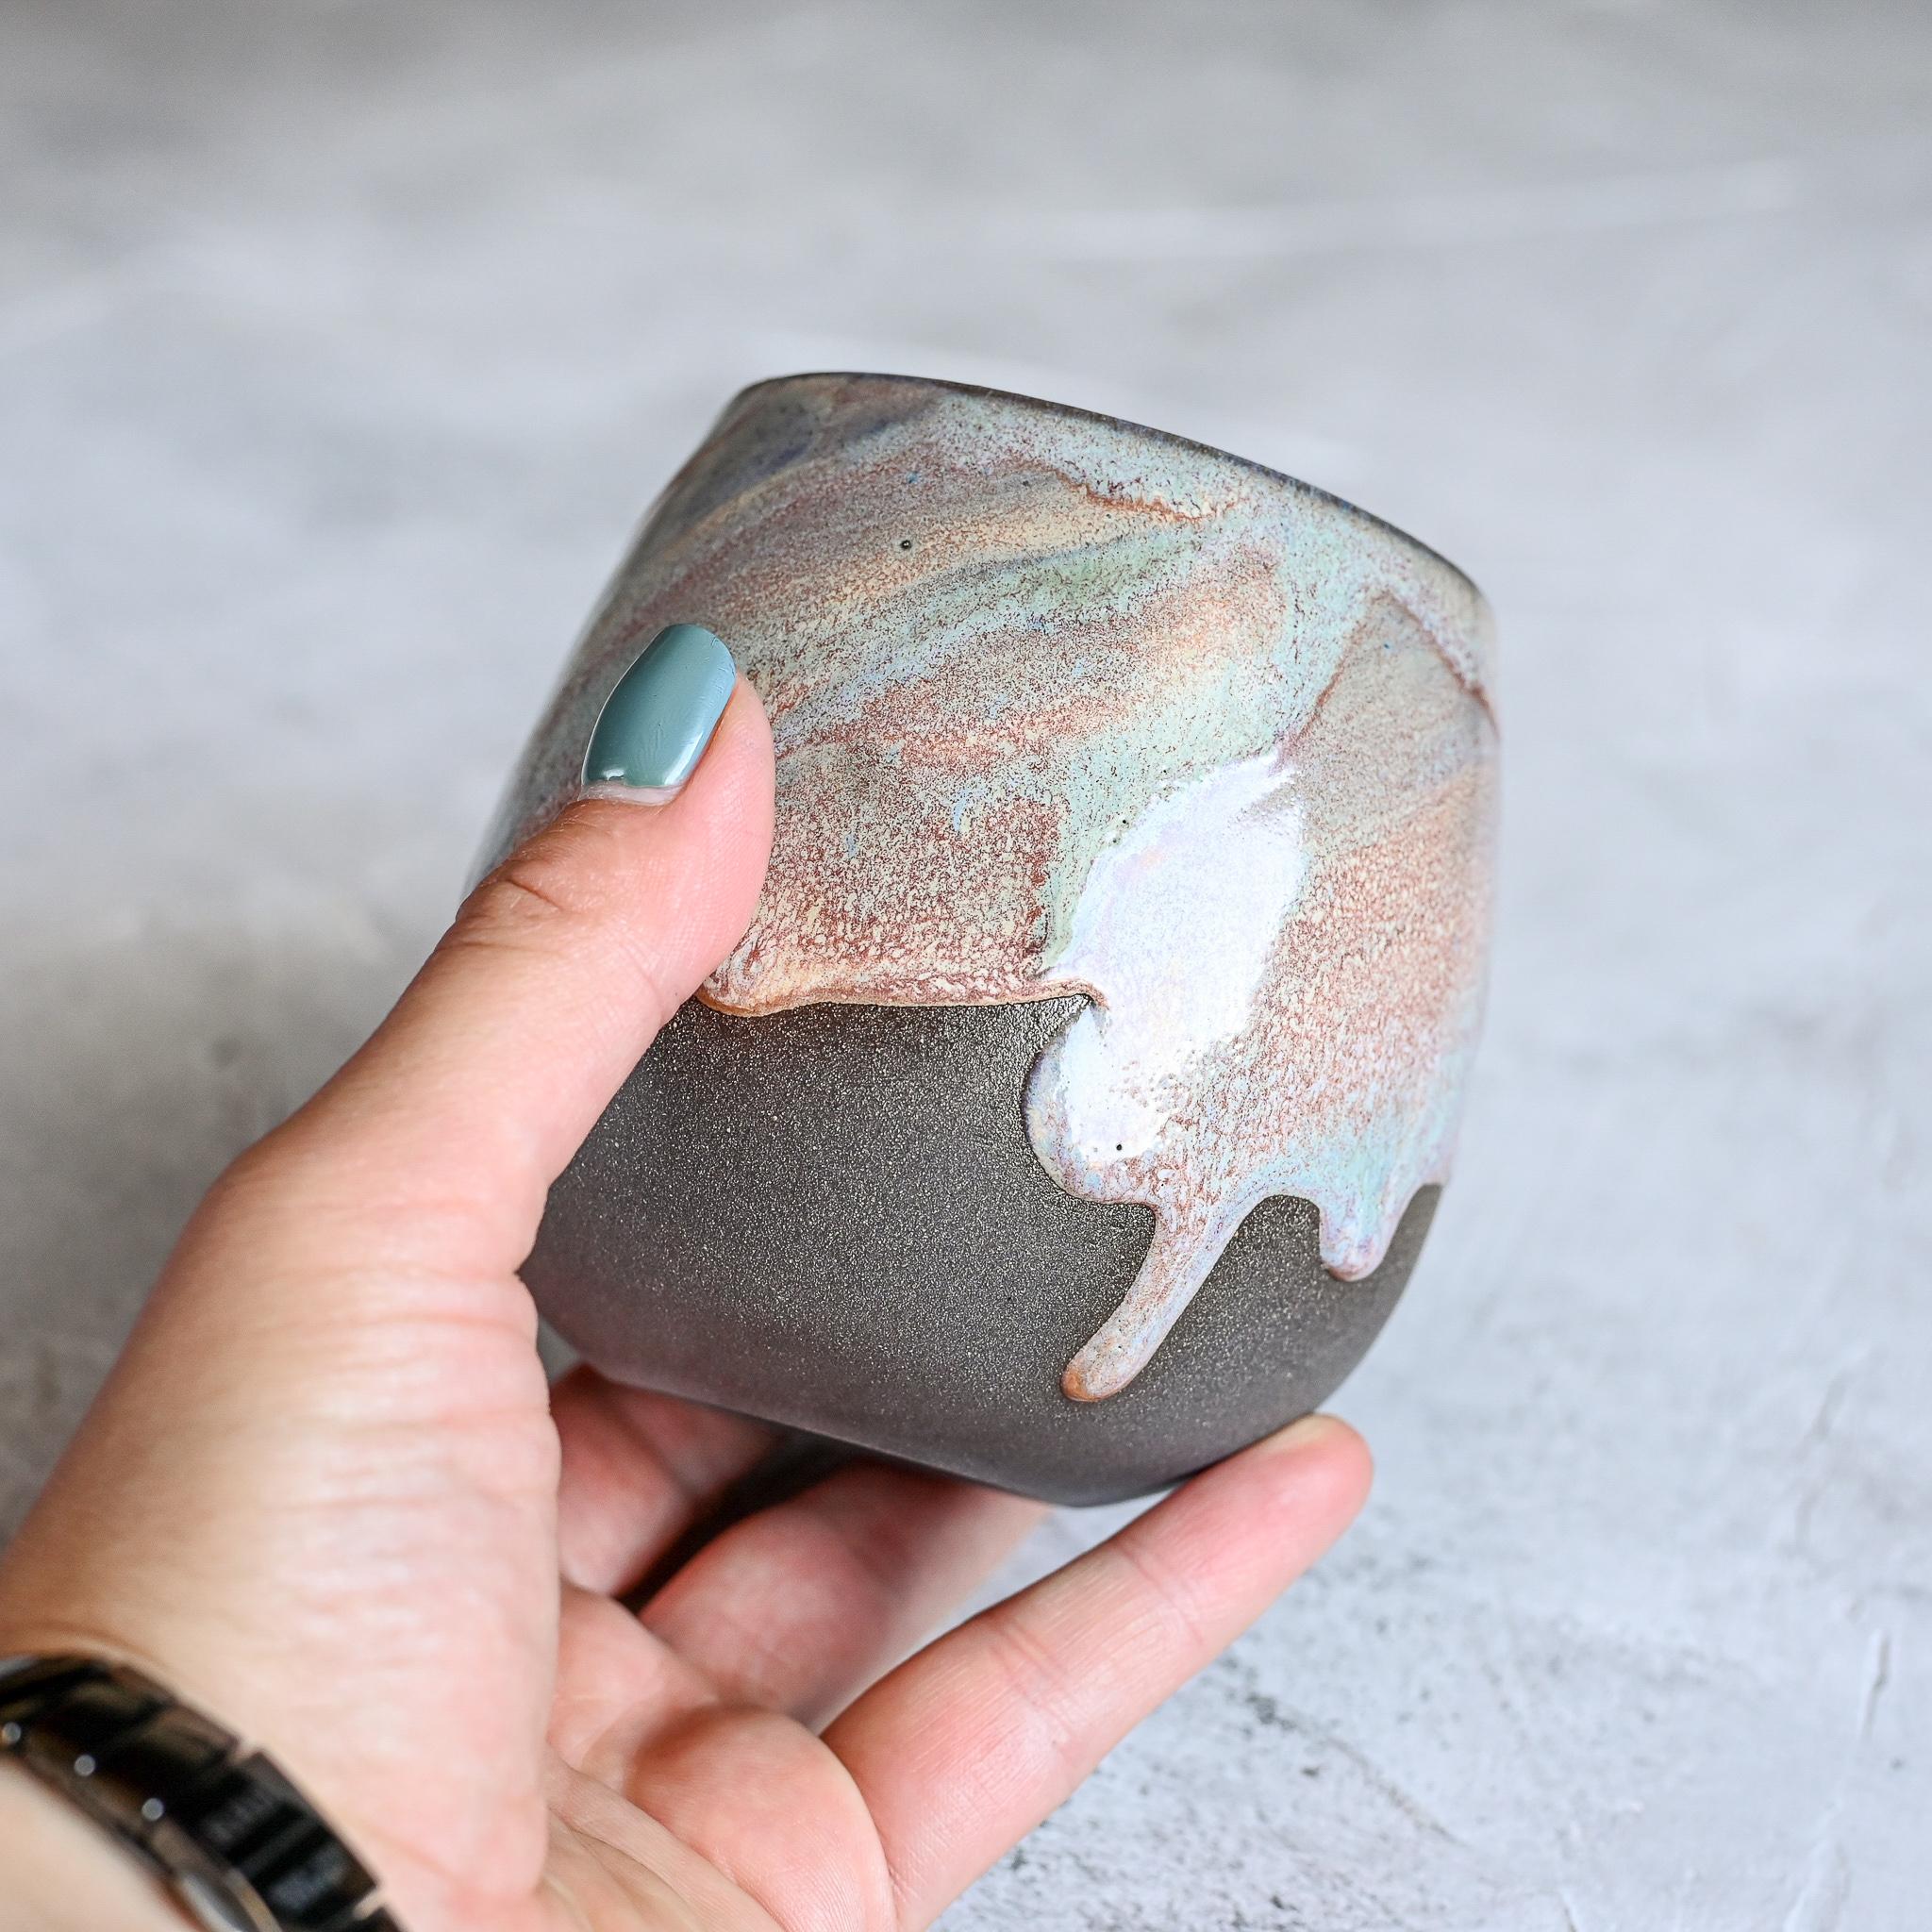 картинка Керамический стакан Марии Левиной 17 - DishWishes.Ru